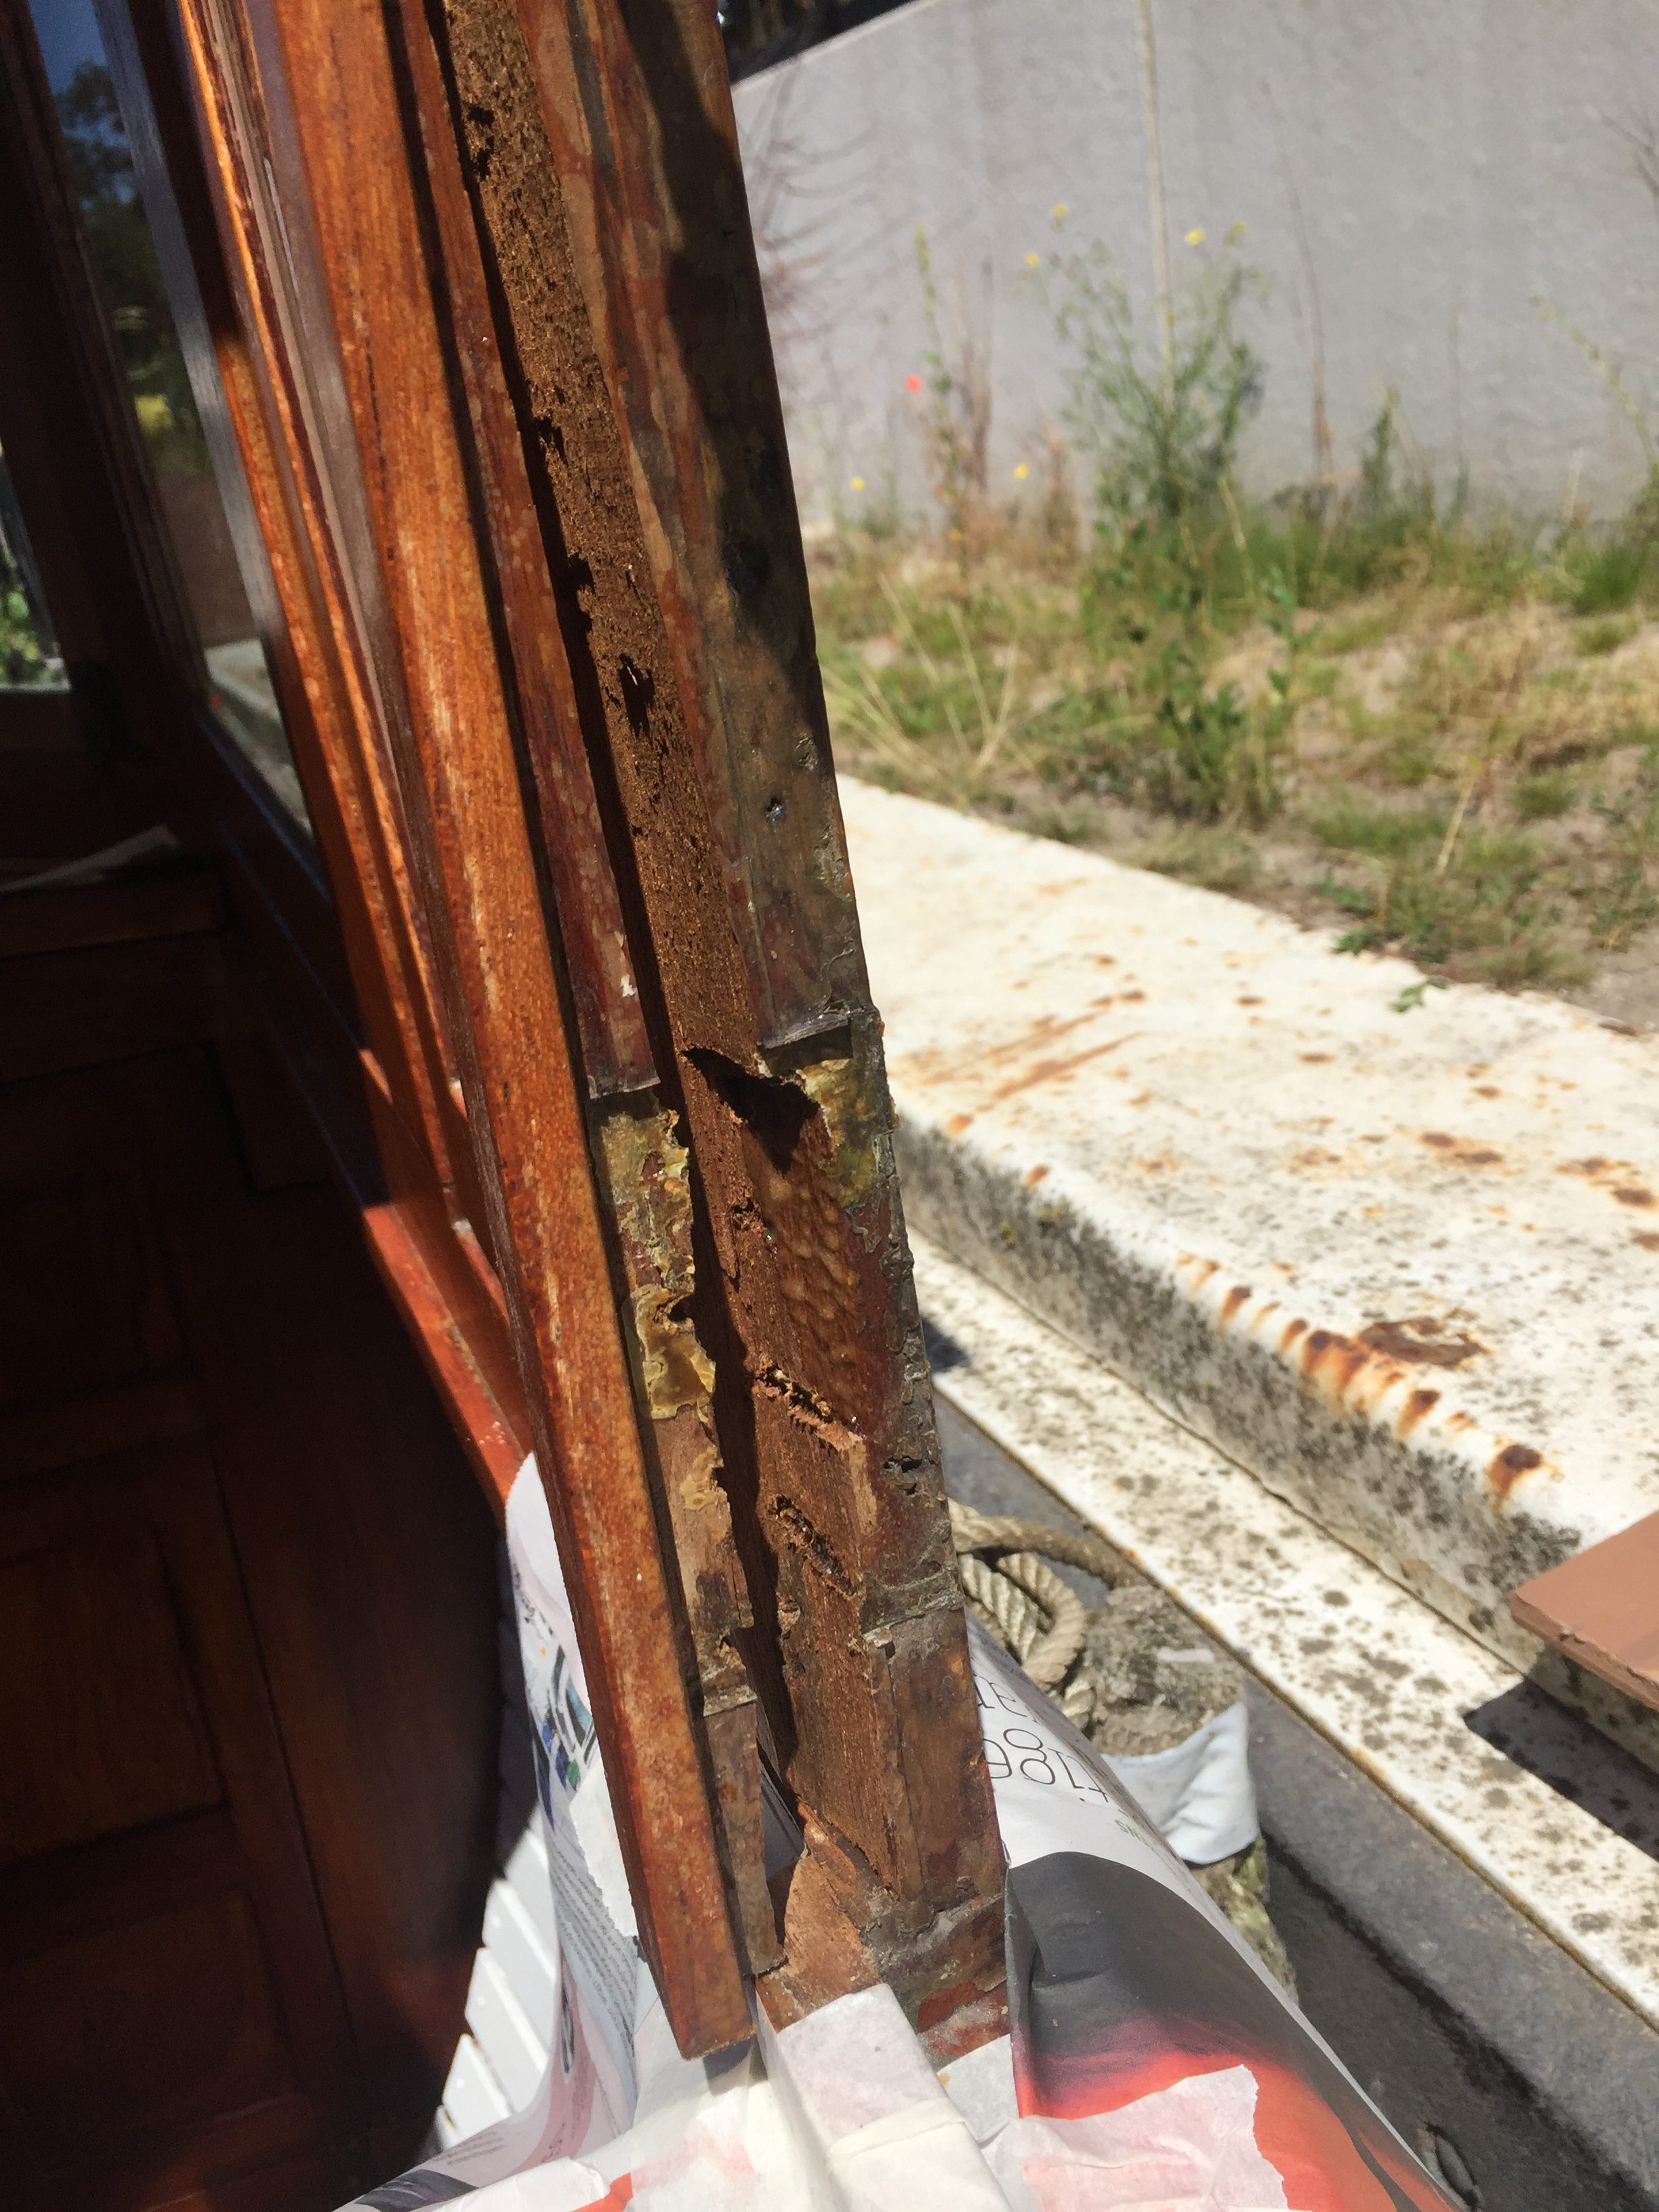 Reparatie antiek salonbootje 'Lelie'